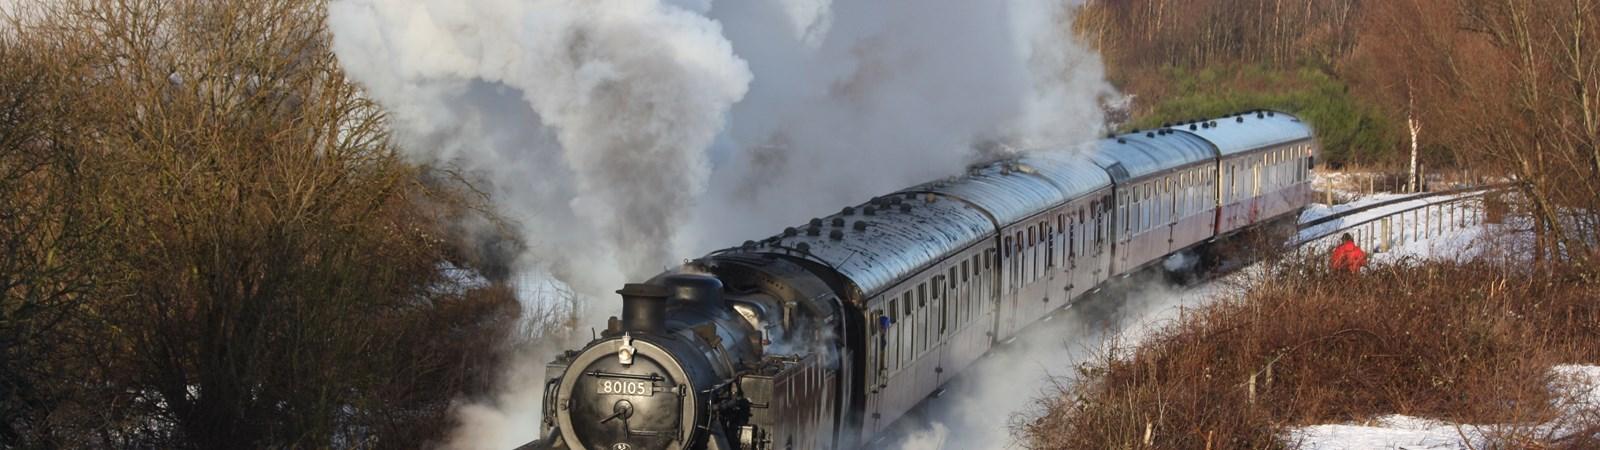 Bo'ness & Kinneil Railway | Steam Trains in Scotland|Visit